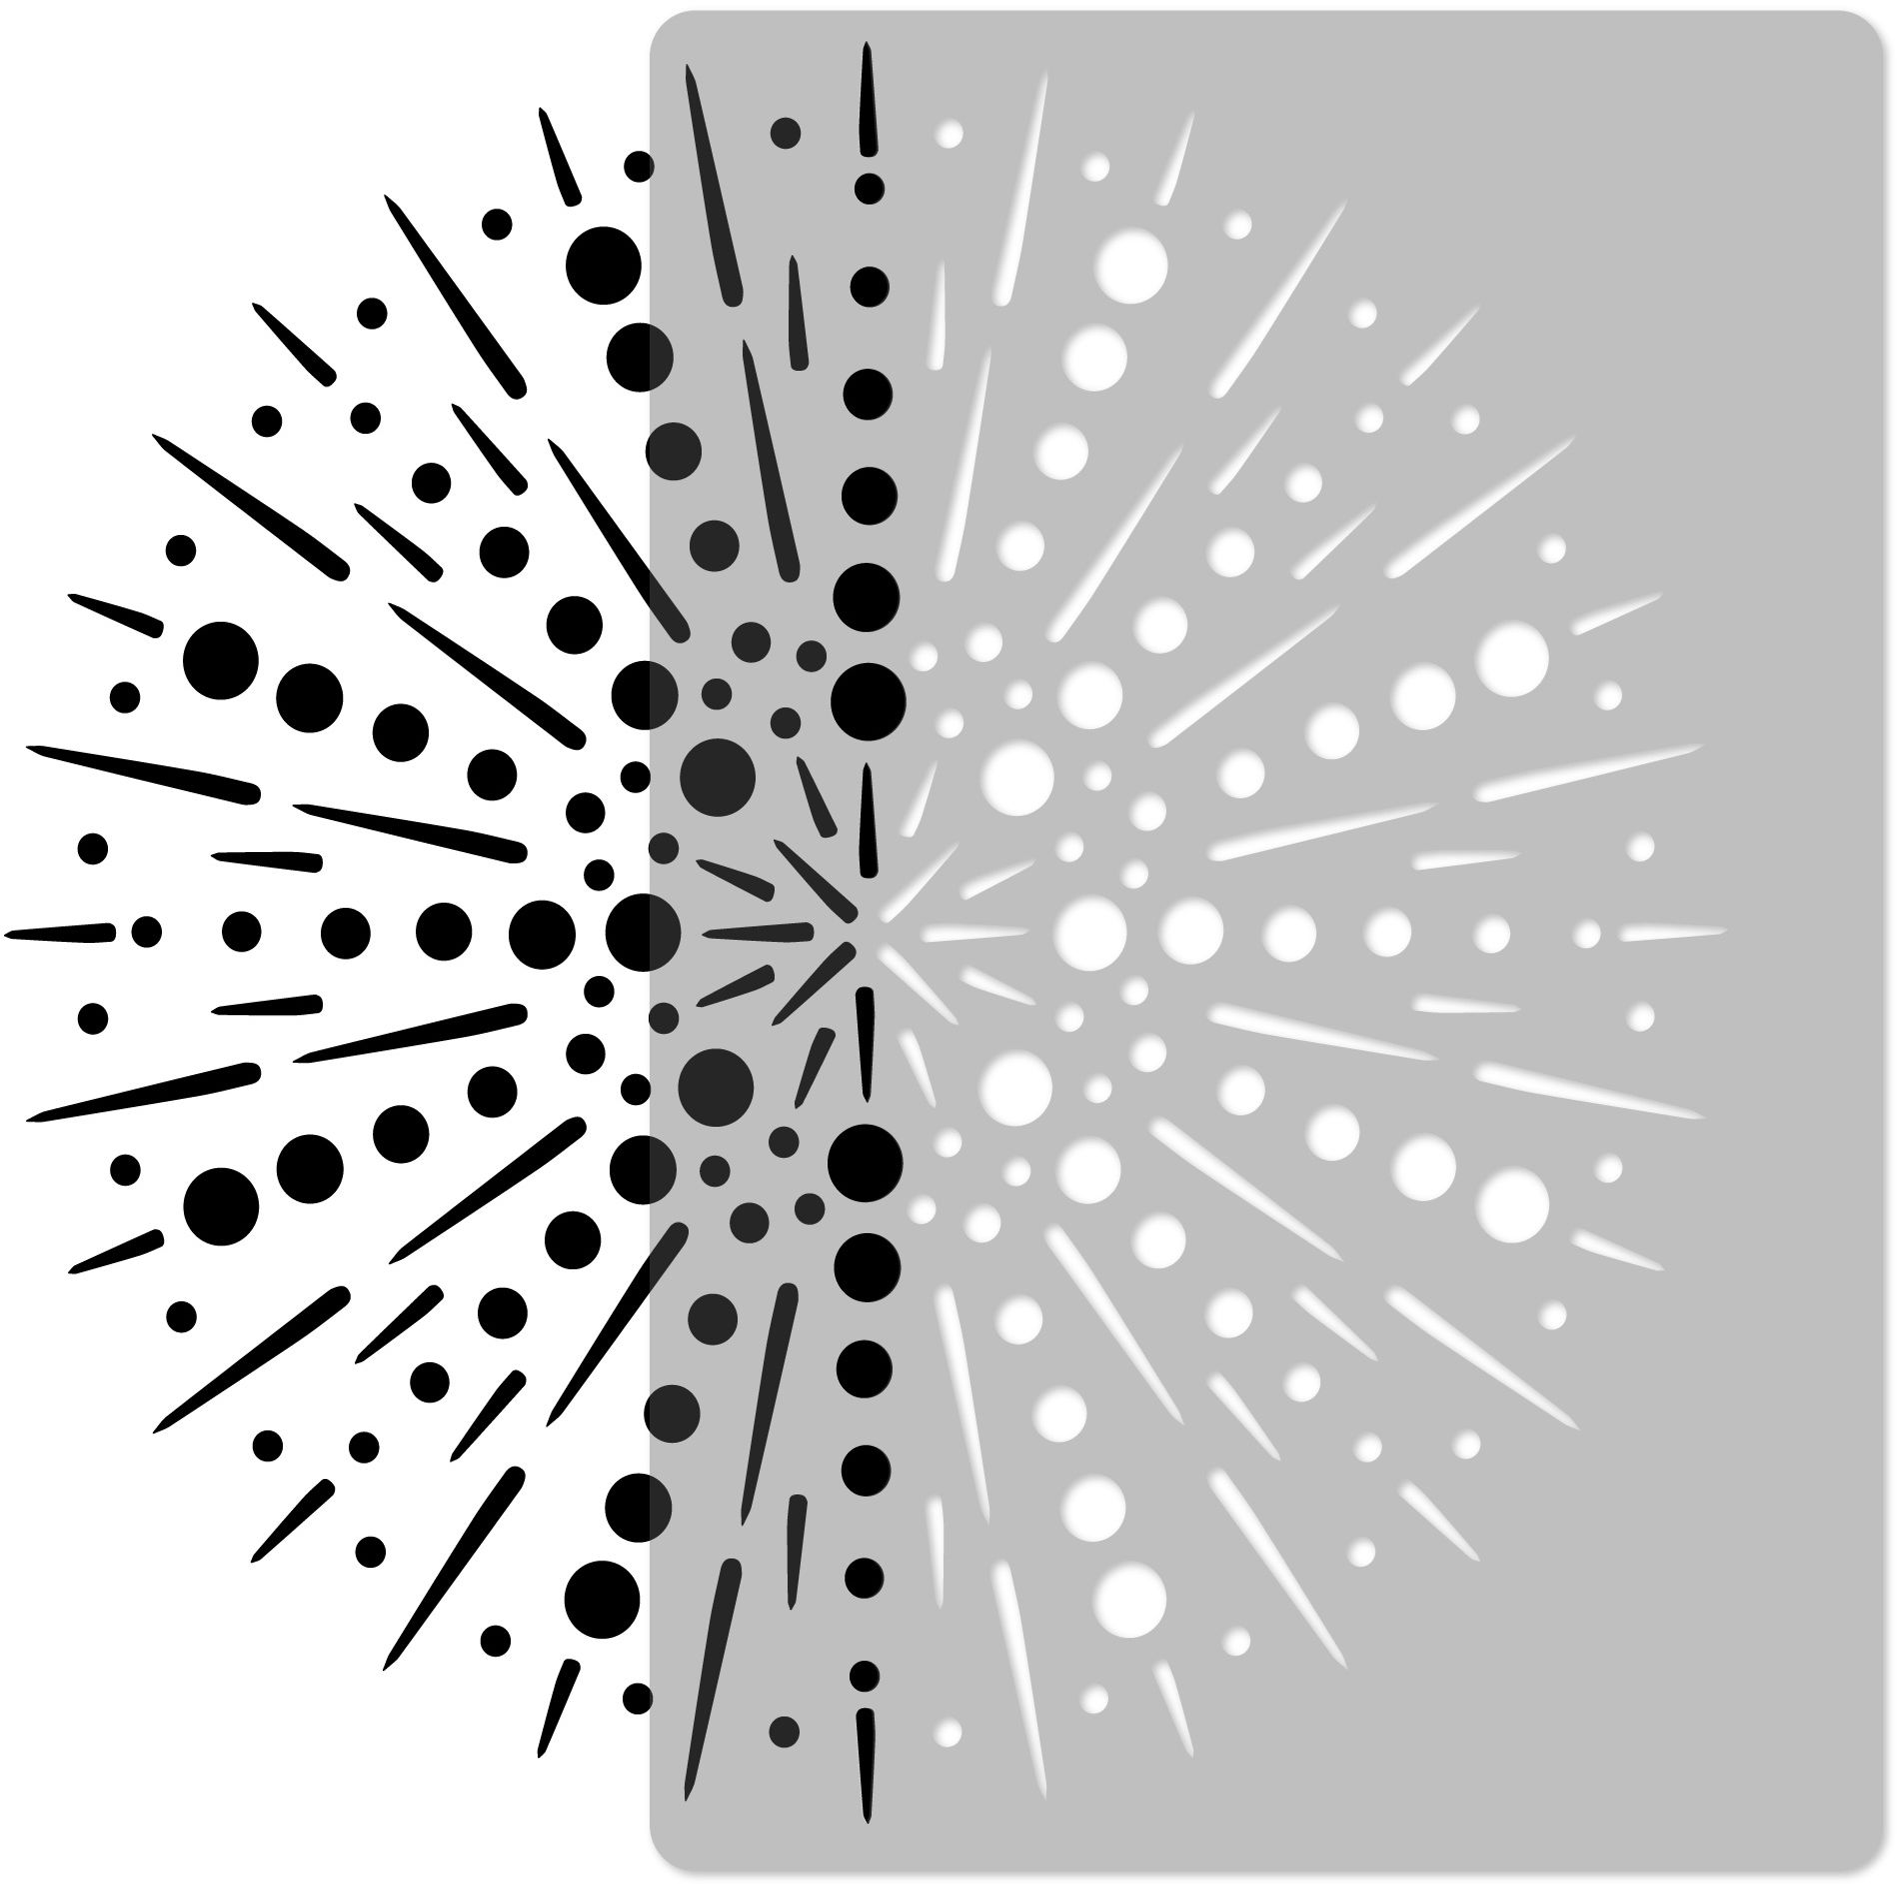 szablon malarski wielokrotny // FAJERWERKI [mandala] - MEDIUM (45x65cm)